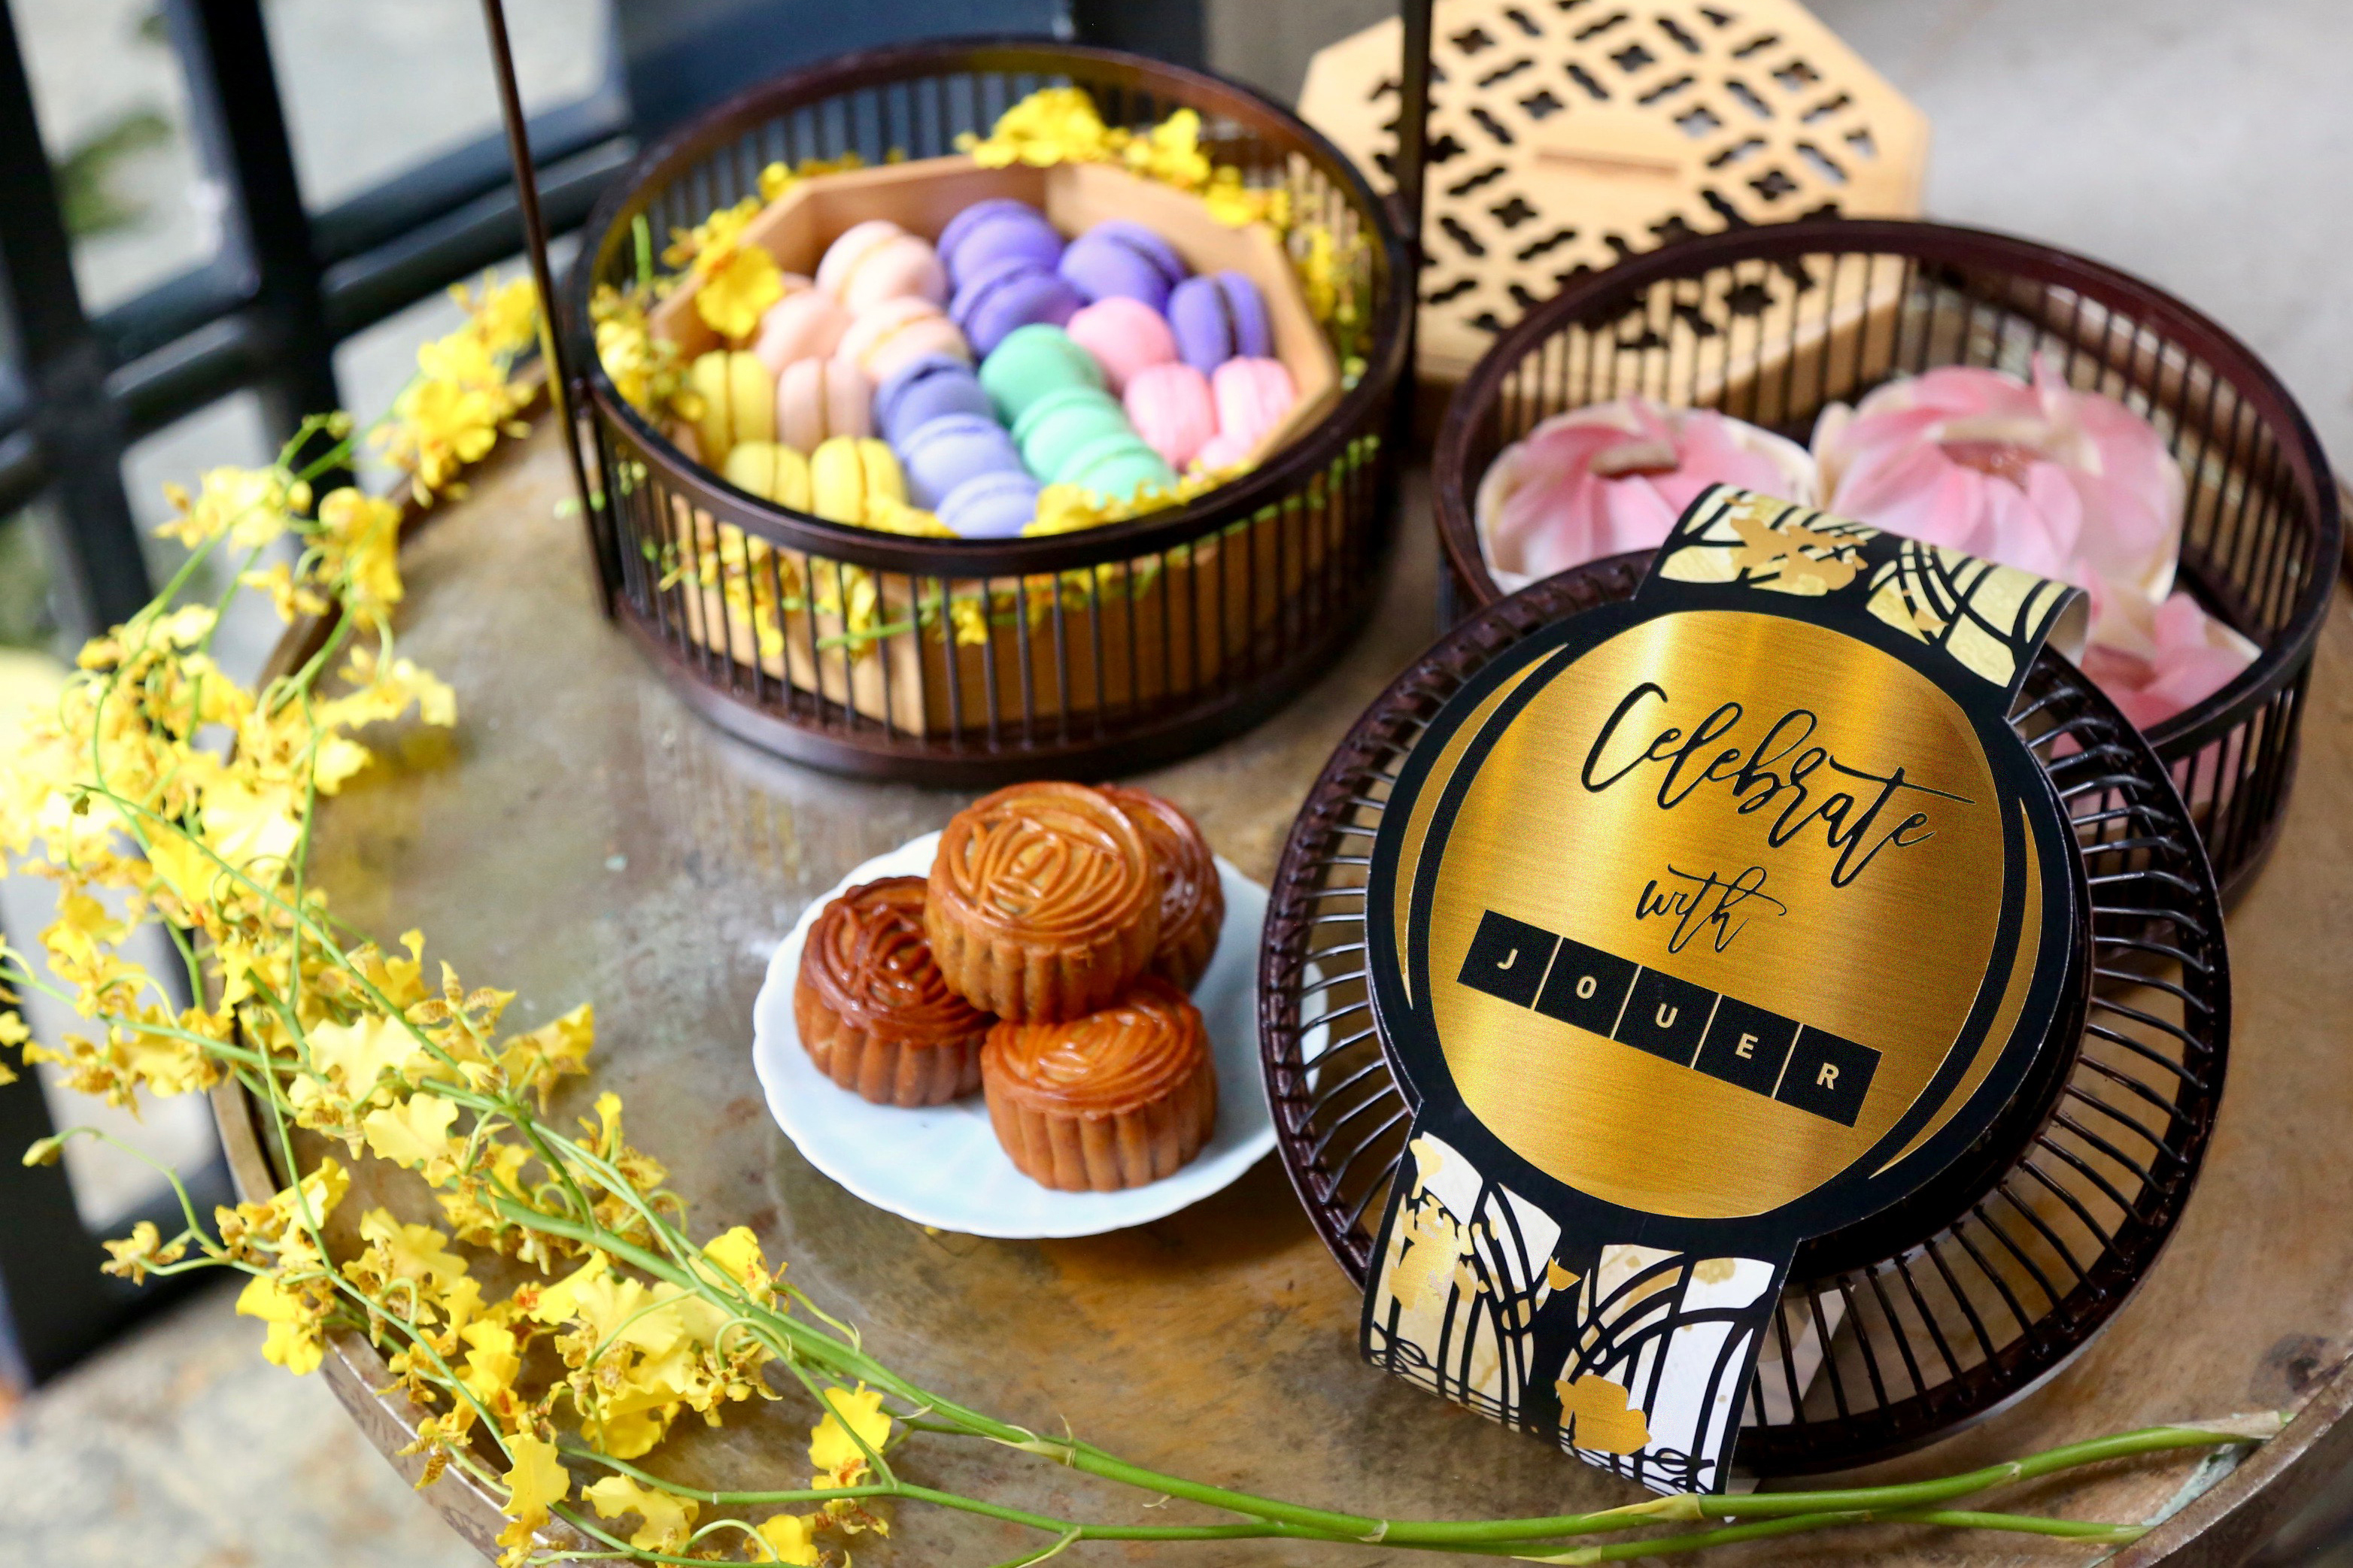 Jouer Mid-Autumn Mooncake & Macaron Gift Hamper